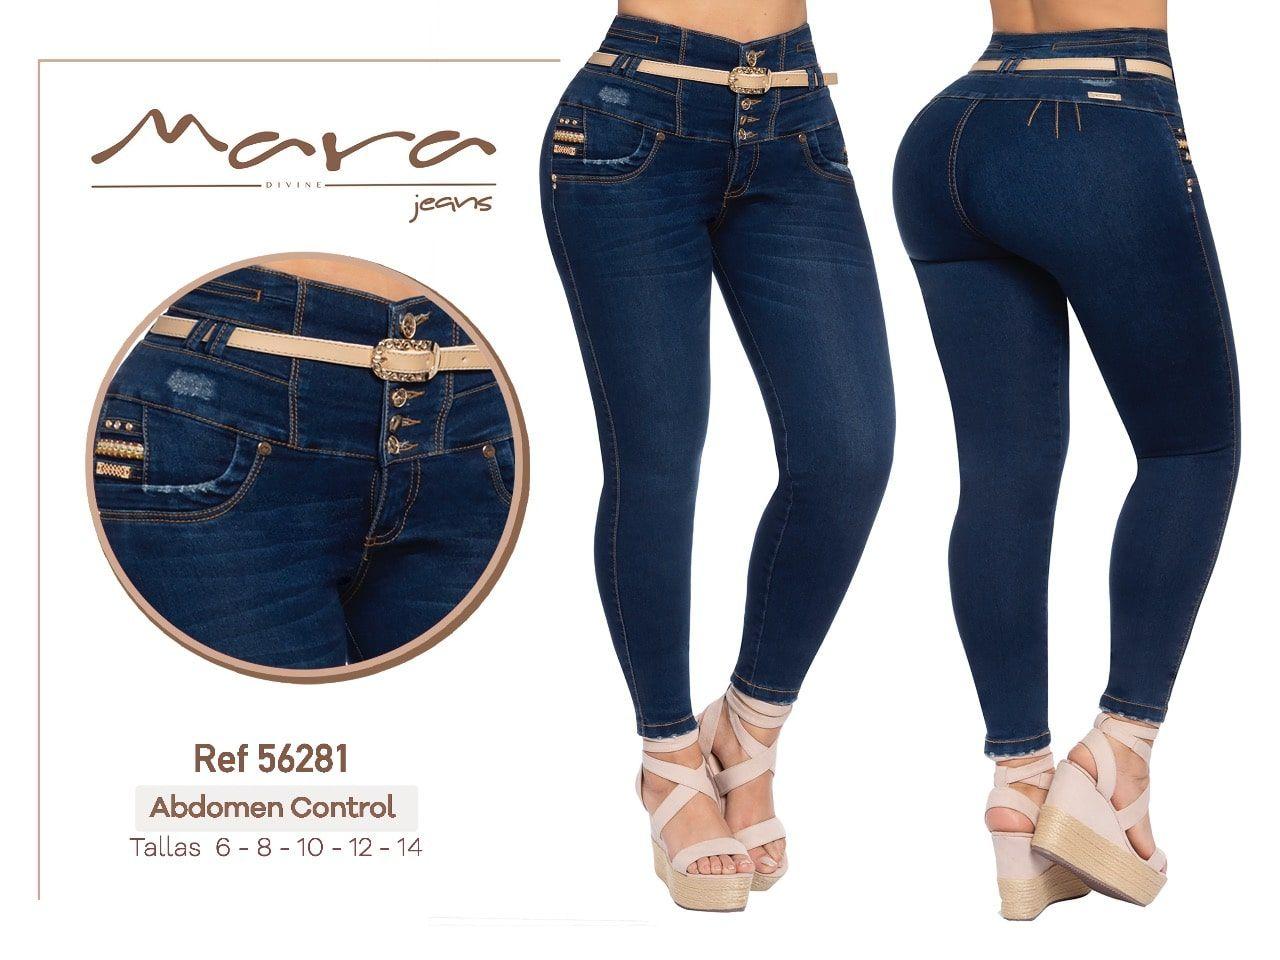 Pantalones Colombianos Jeans De Moda Jeans Colombianos Levanta Cola Pantalones Colombianos